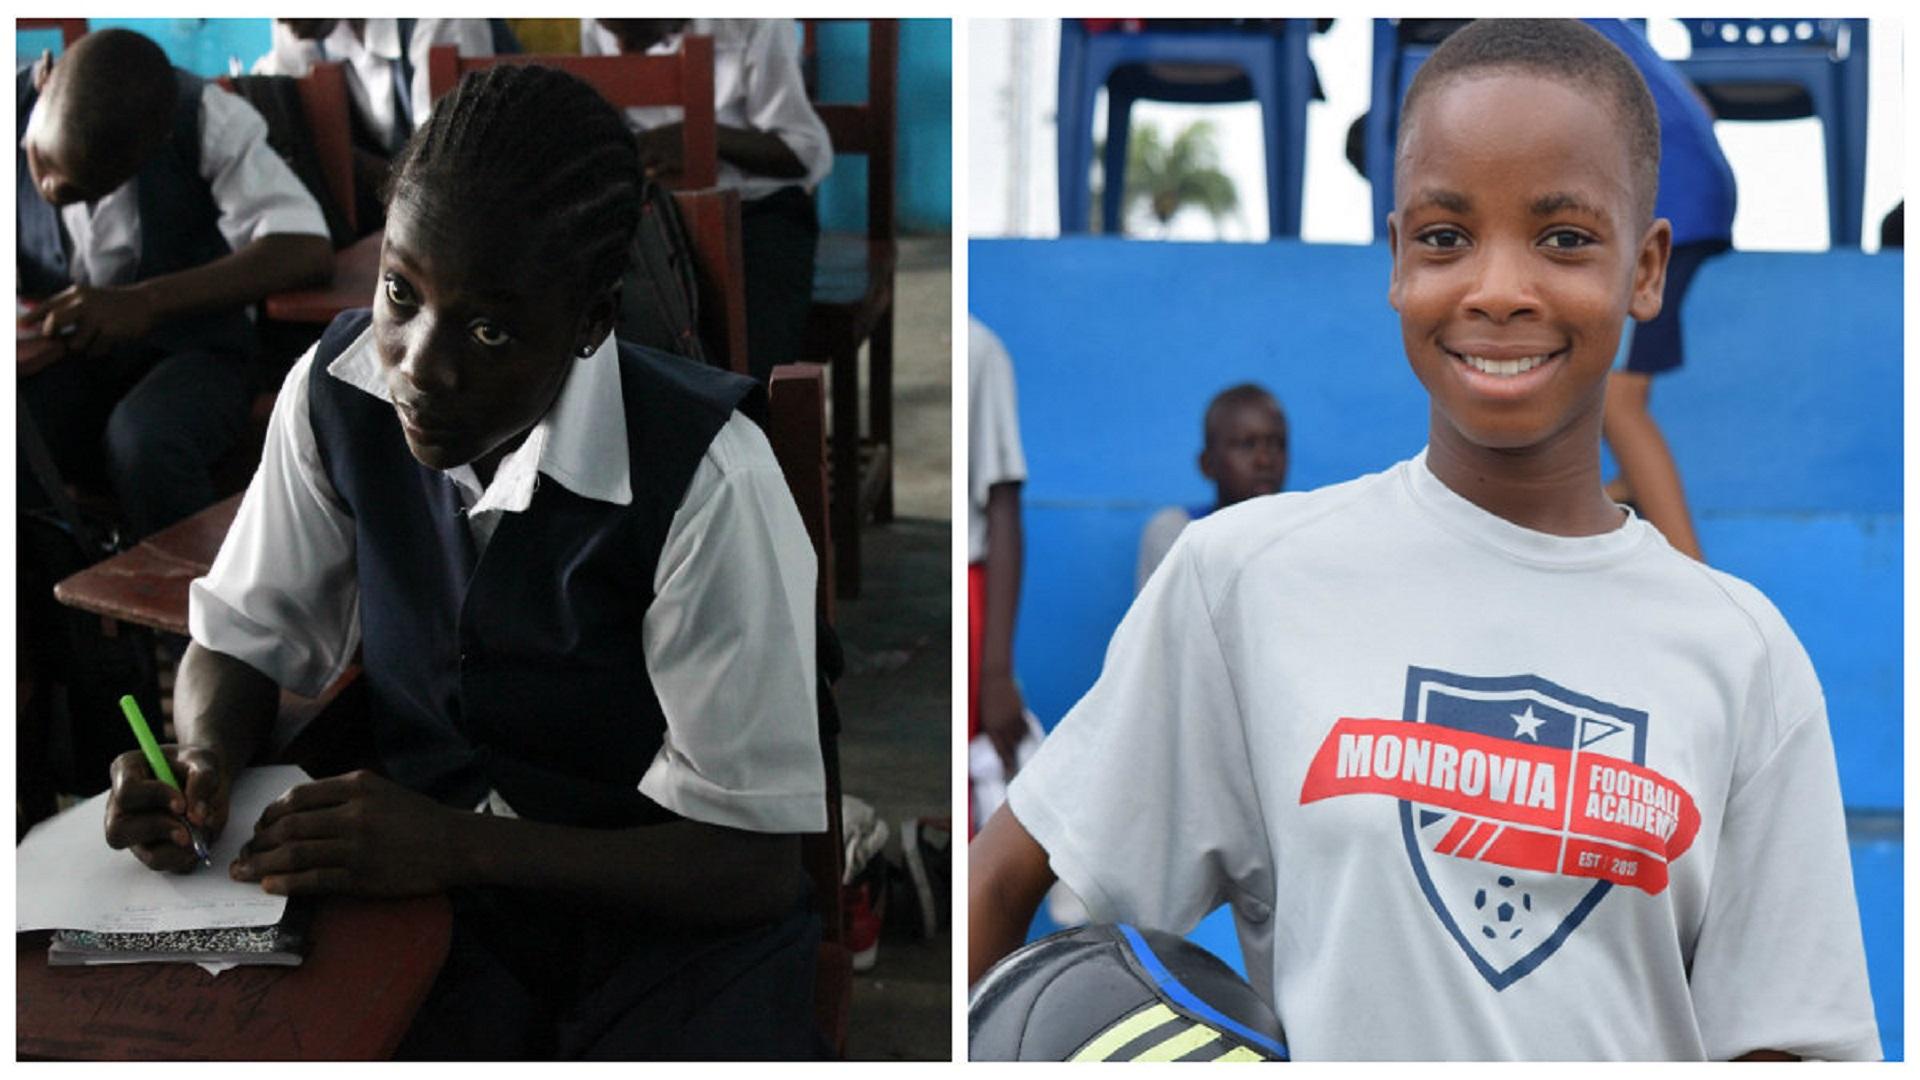 Blessing and Jessica, Monrovia football